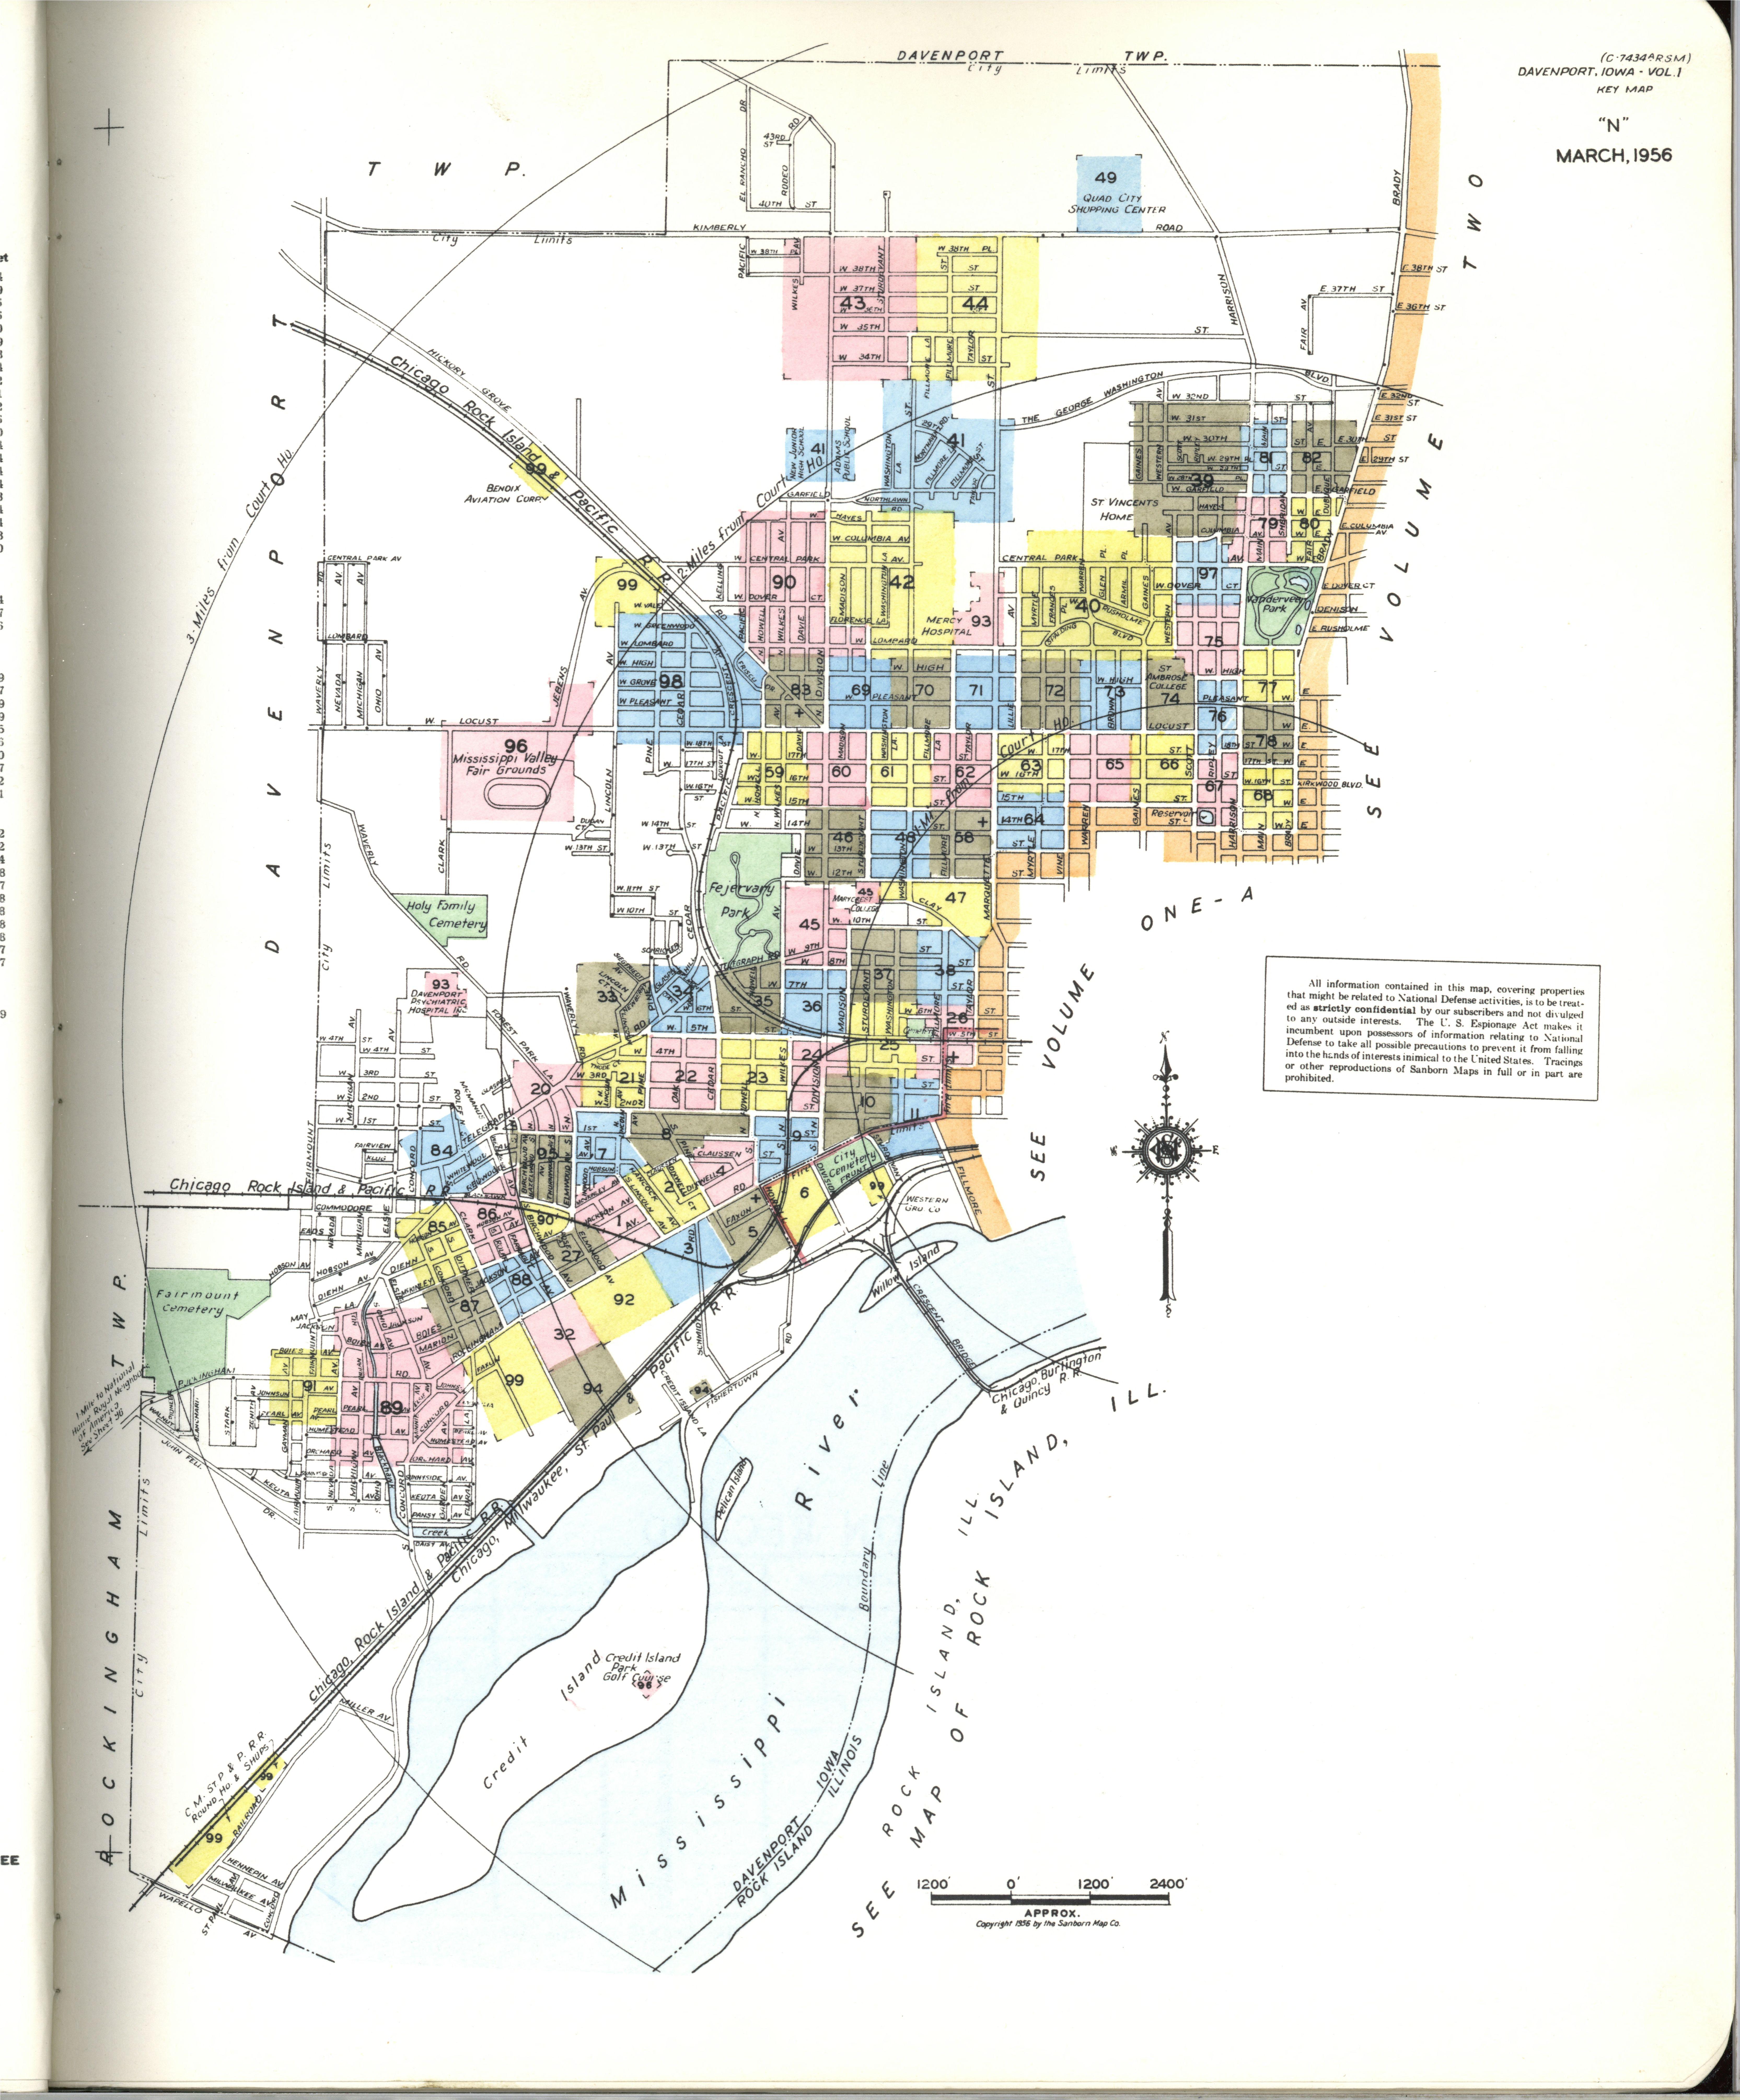 File:Sanborn Fire Insurance Map from Davenport, Scott County ... on iowa map by county, davenport iowa map, iowa roadway map, wisconsin central map, iowa map of america, iowa driving map, iowa travel map, iowa map usa, i-80 map, western railway of alabama map, ne iowa map, iowa metro map, iowa road map, iowa maps with major cities, iowa utility map, google maps iowa street map, illinois railway museum map, east broad top map, saint charles county zip code map, iowa map with mile markers,